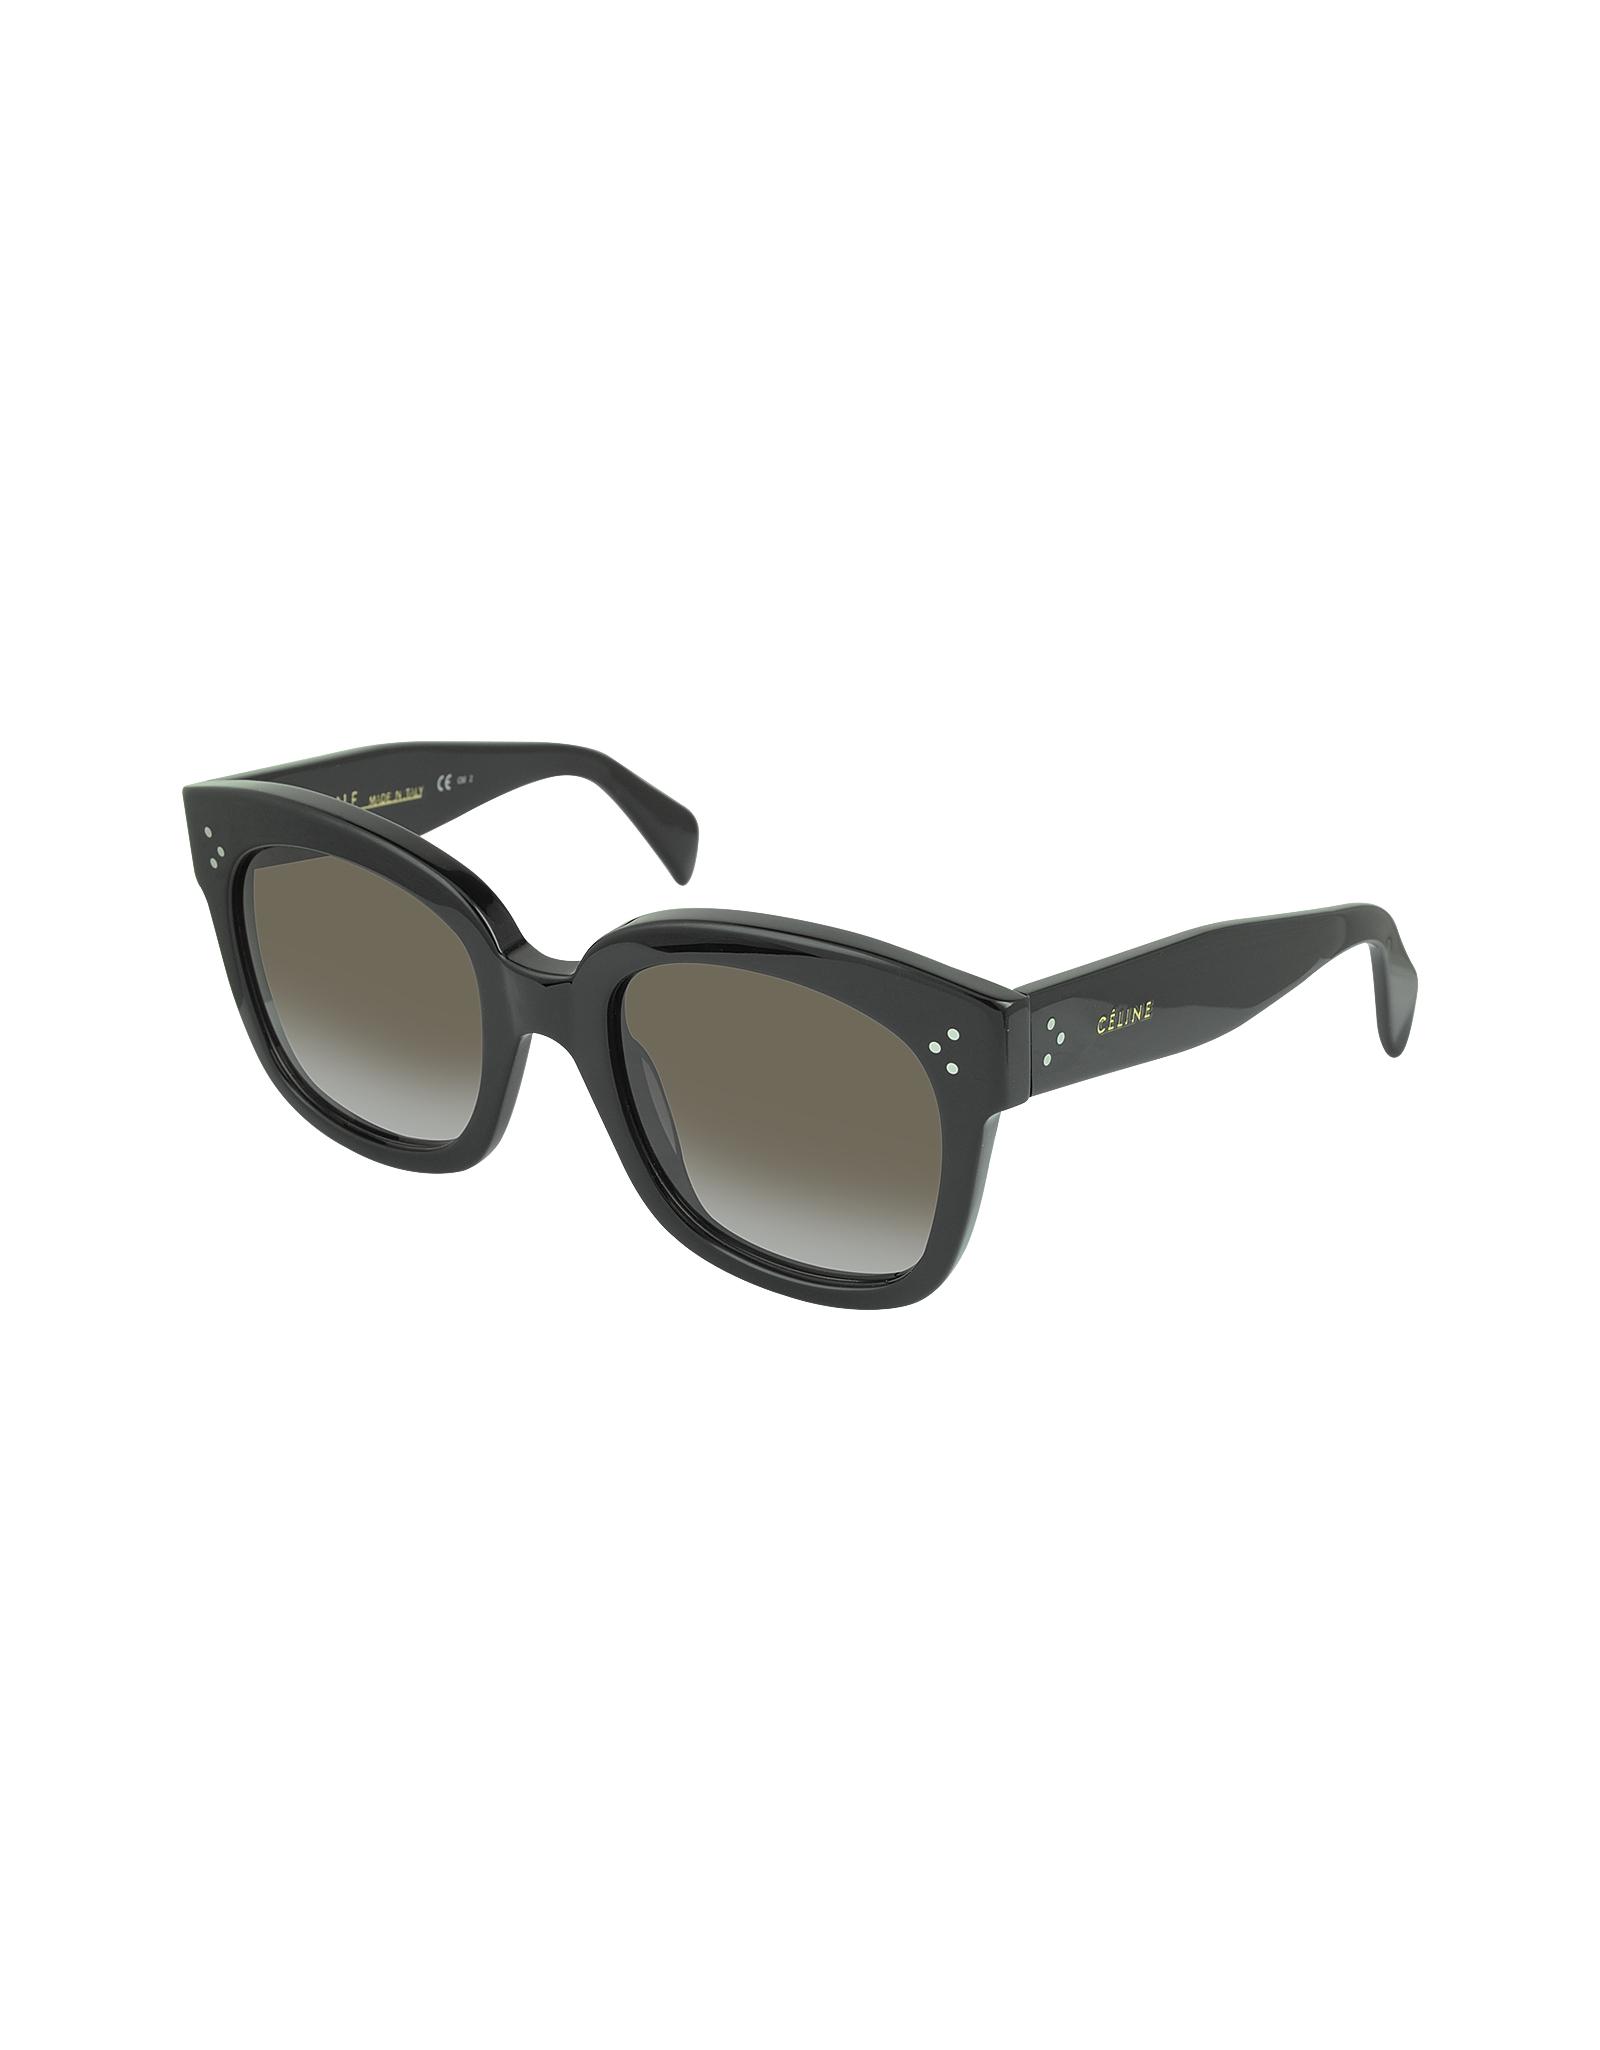 eadce28da02 Lyst - C Line Cl41805 s New Audrey Black Acetate Sunglasses in Black